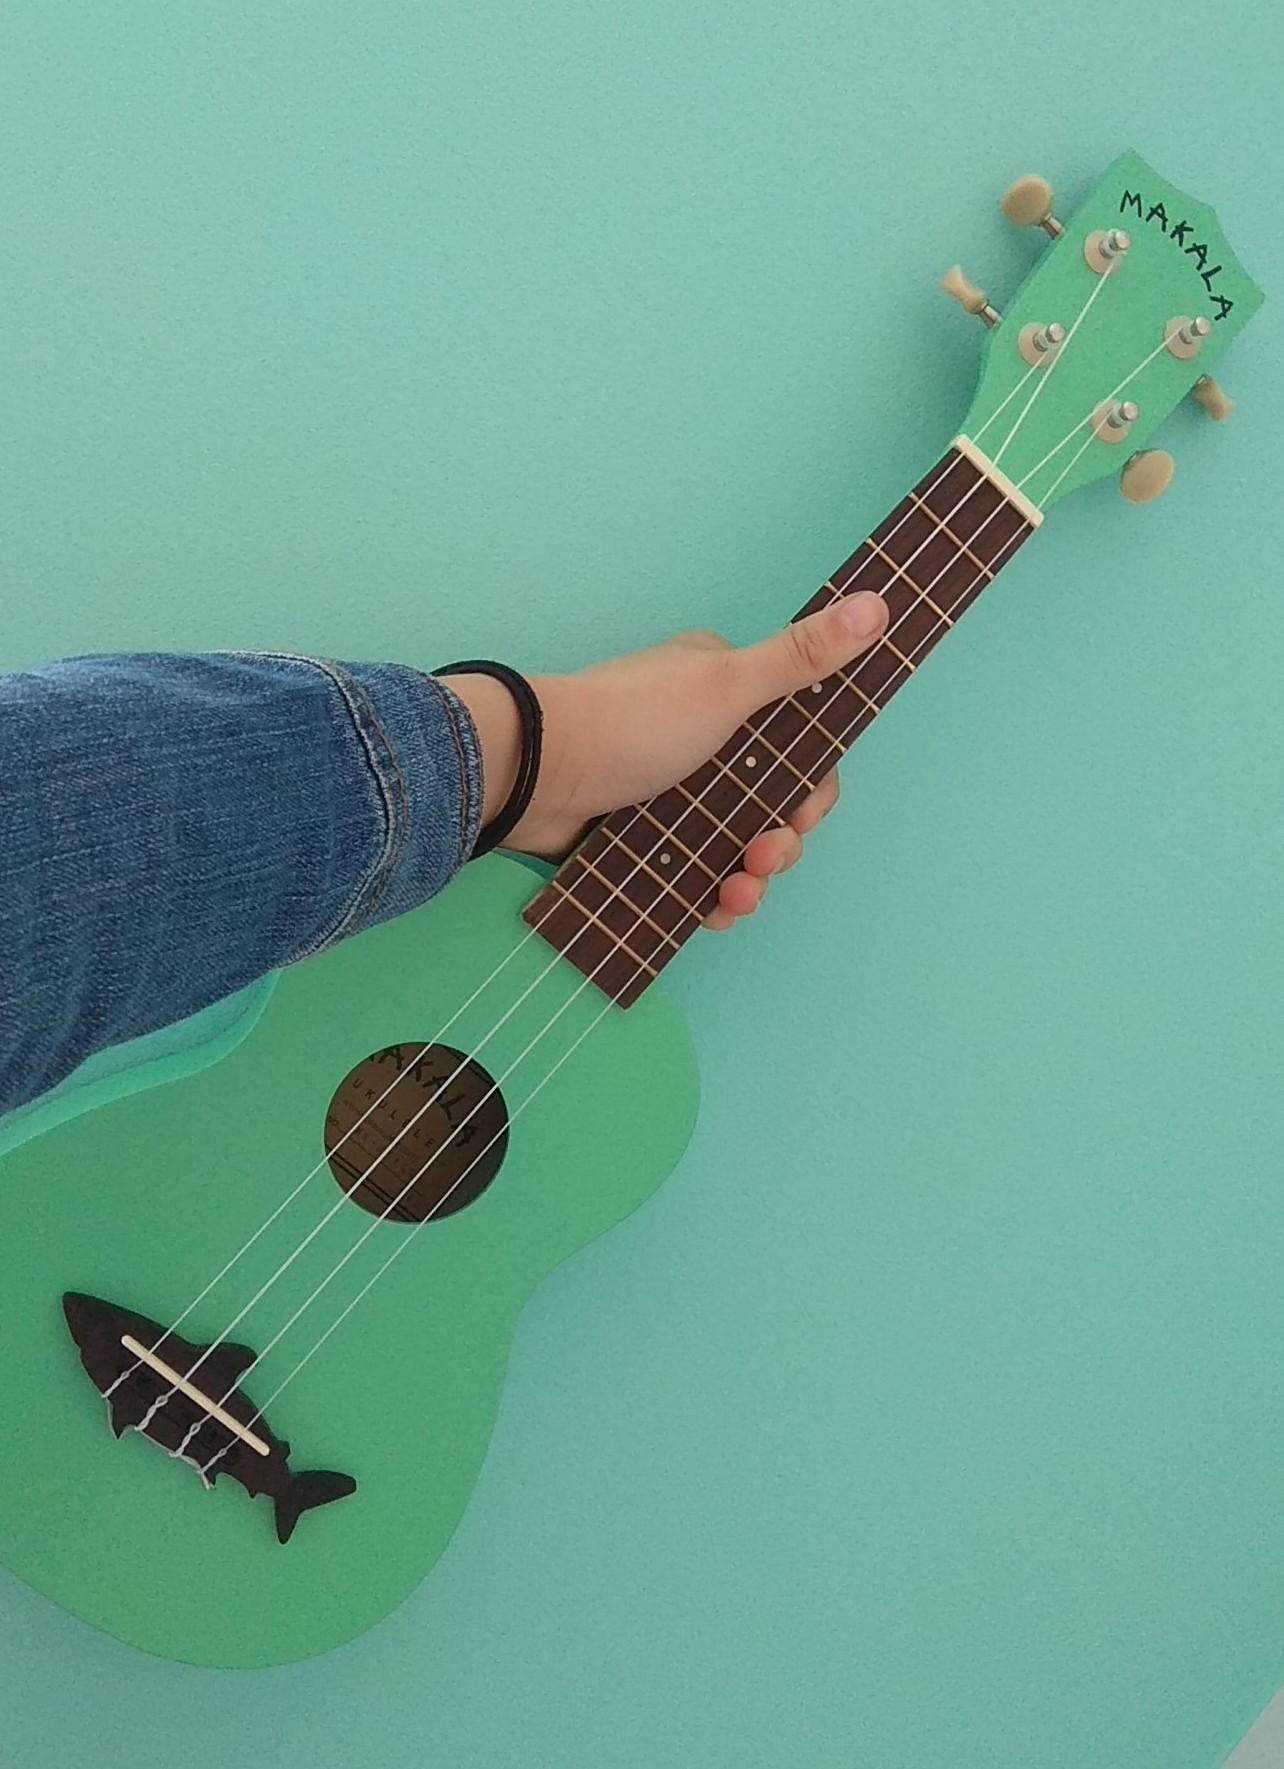 Como tocar faded no ukulele